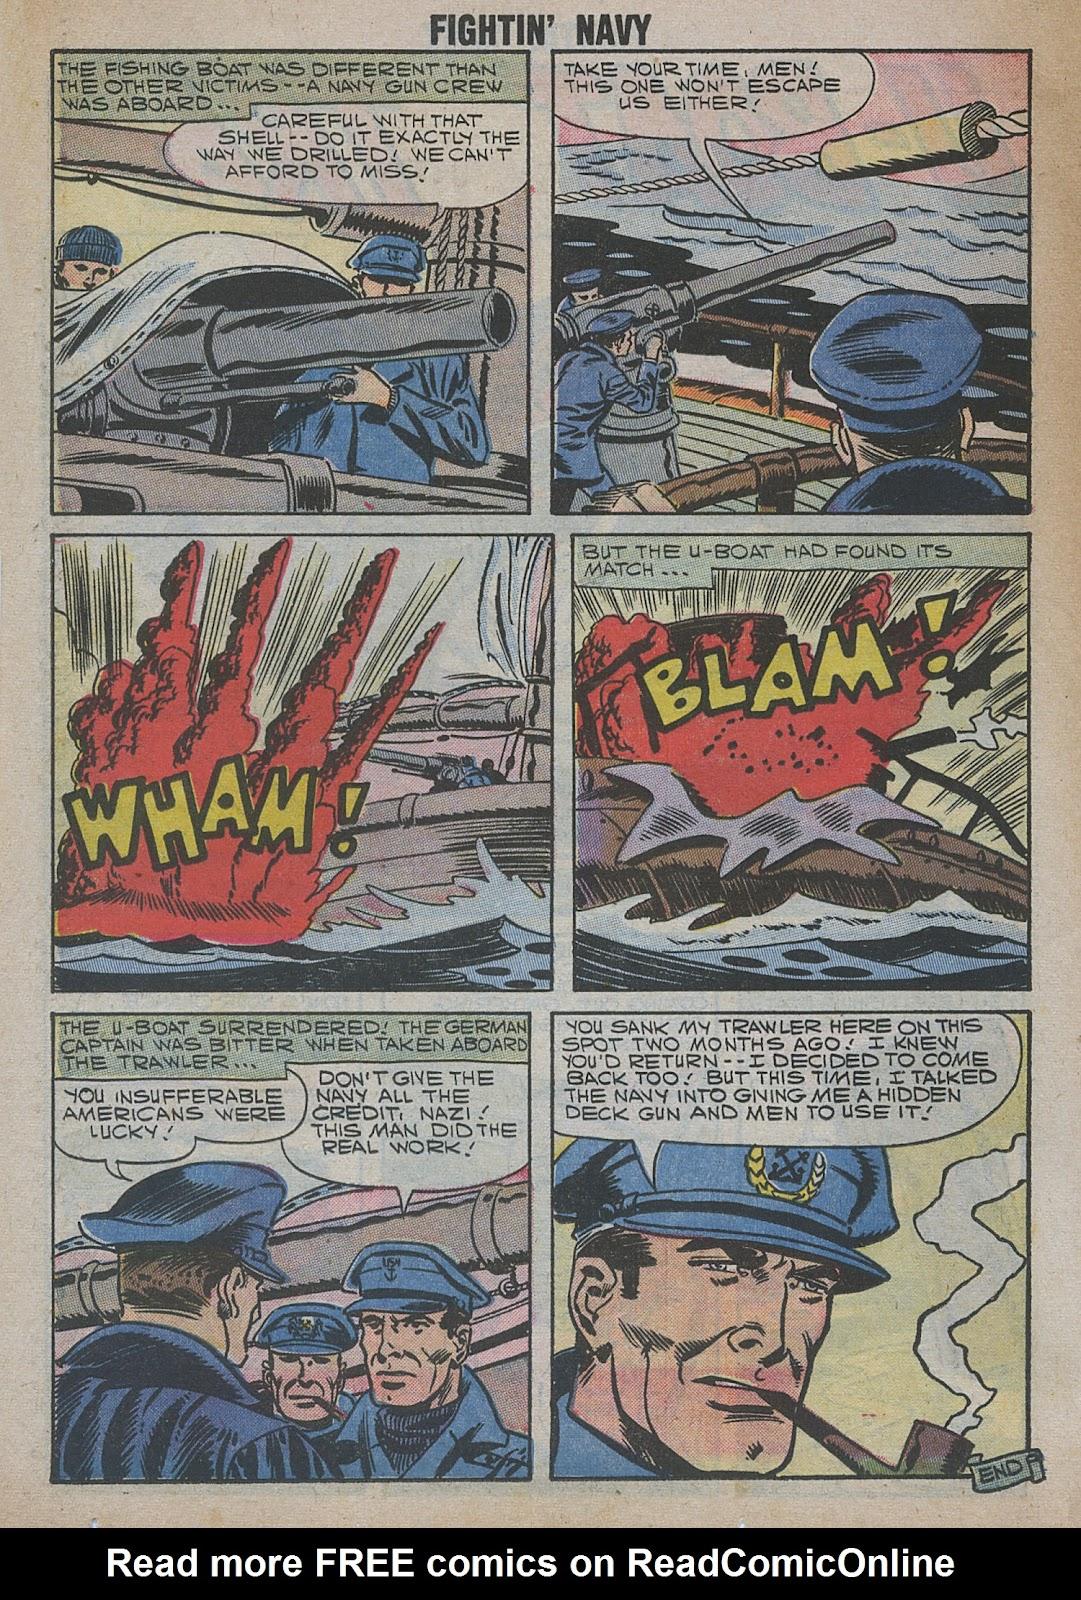 Read online Fightin' Navy comic -  Issue #82 - 50